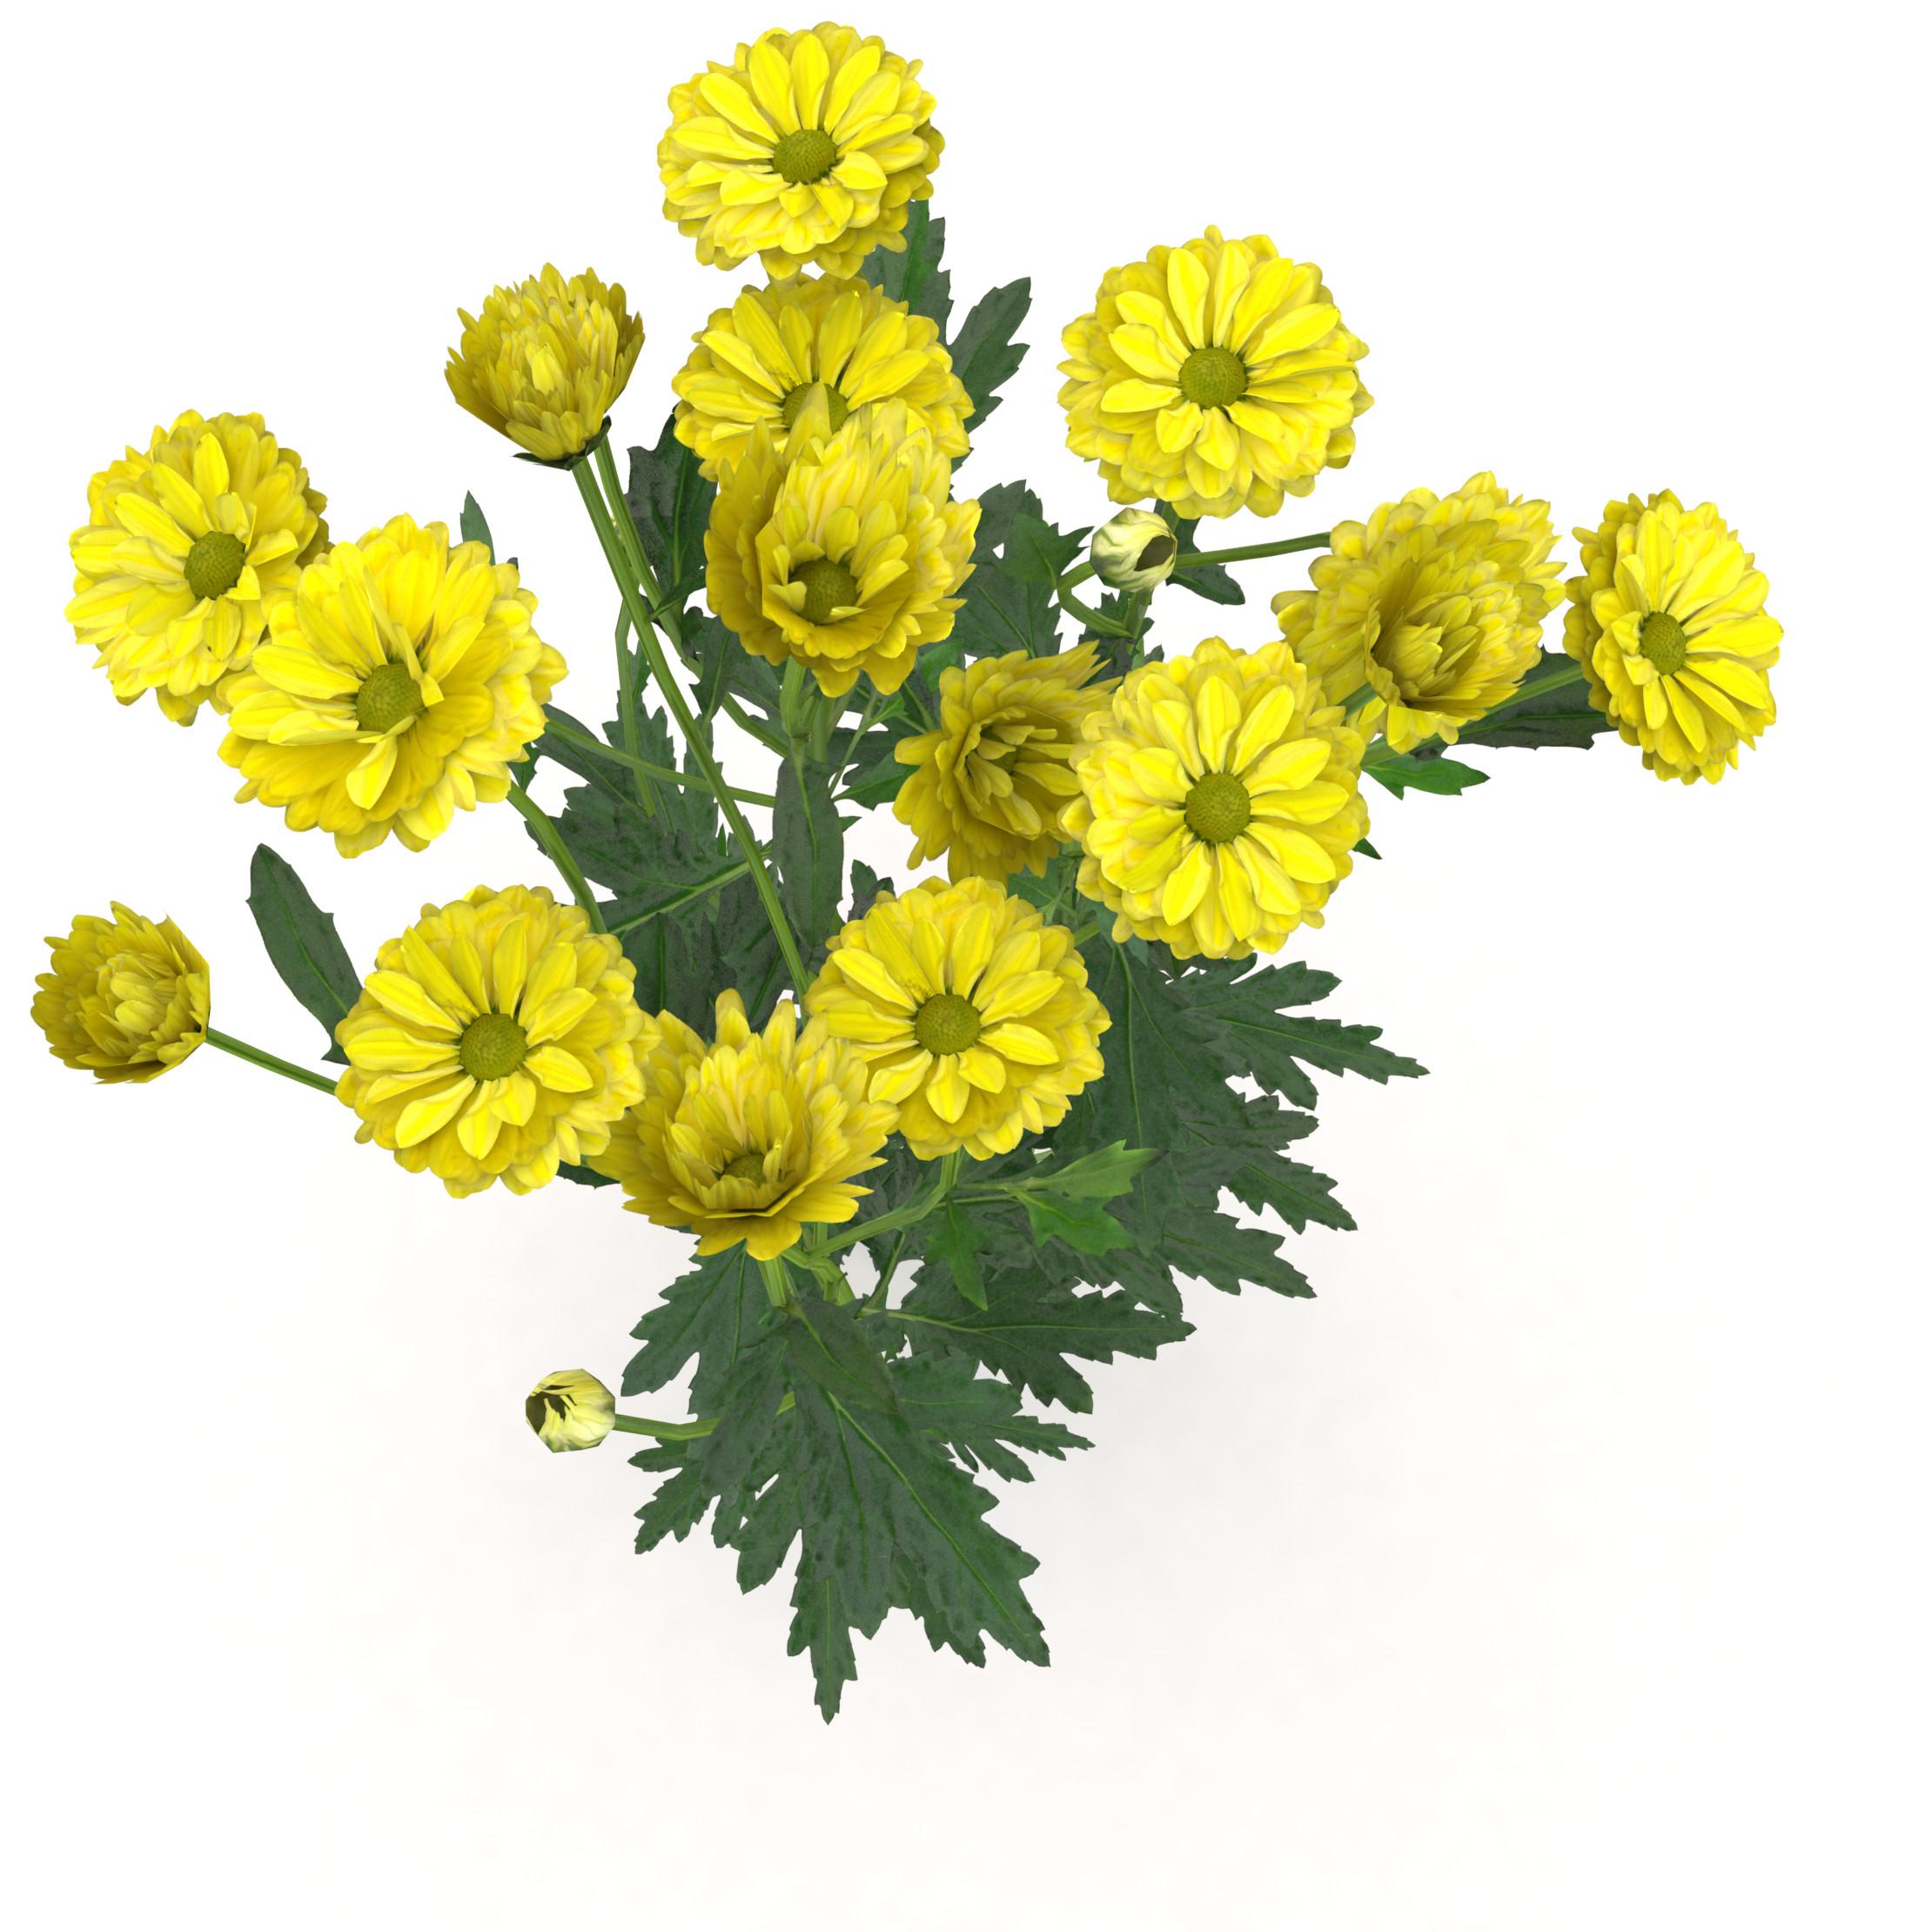 002_chrysanthemum_02.png